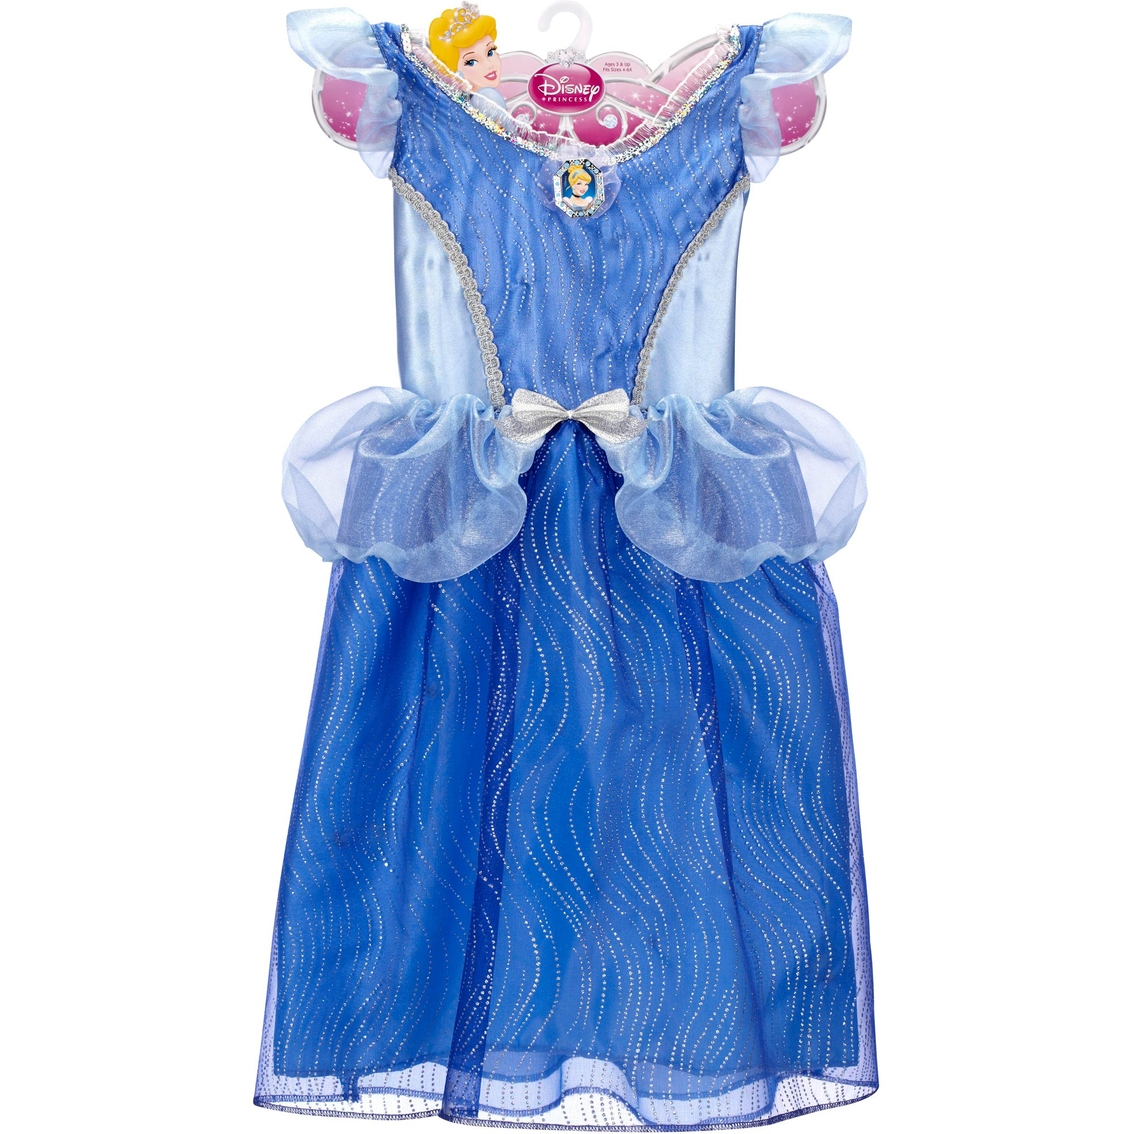 Disney Store Cinderella Light Up Costume Fancy Dress: Disney Princess Cinderella Girl's Deluxe Light Up Dress